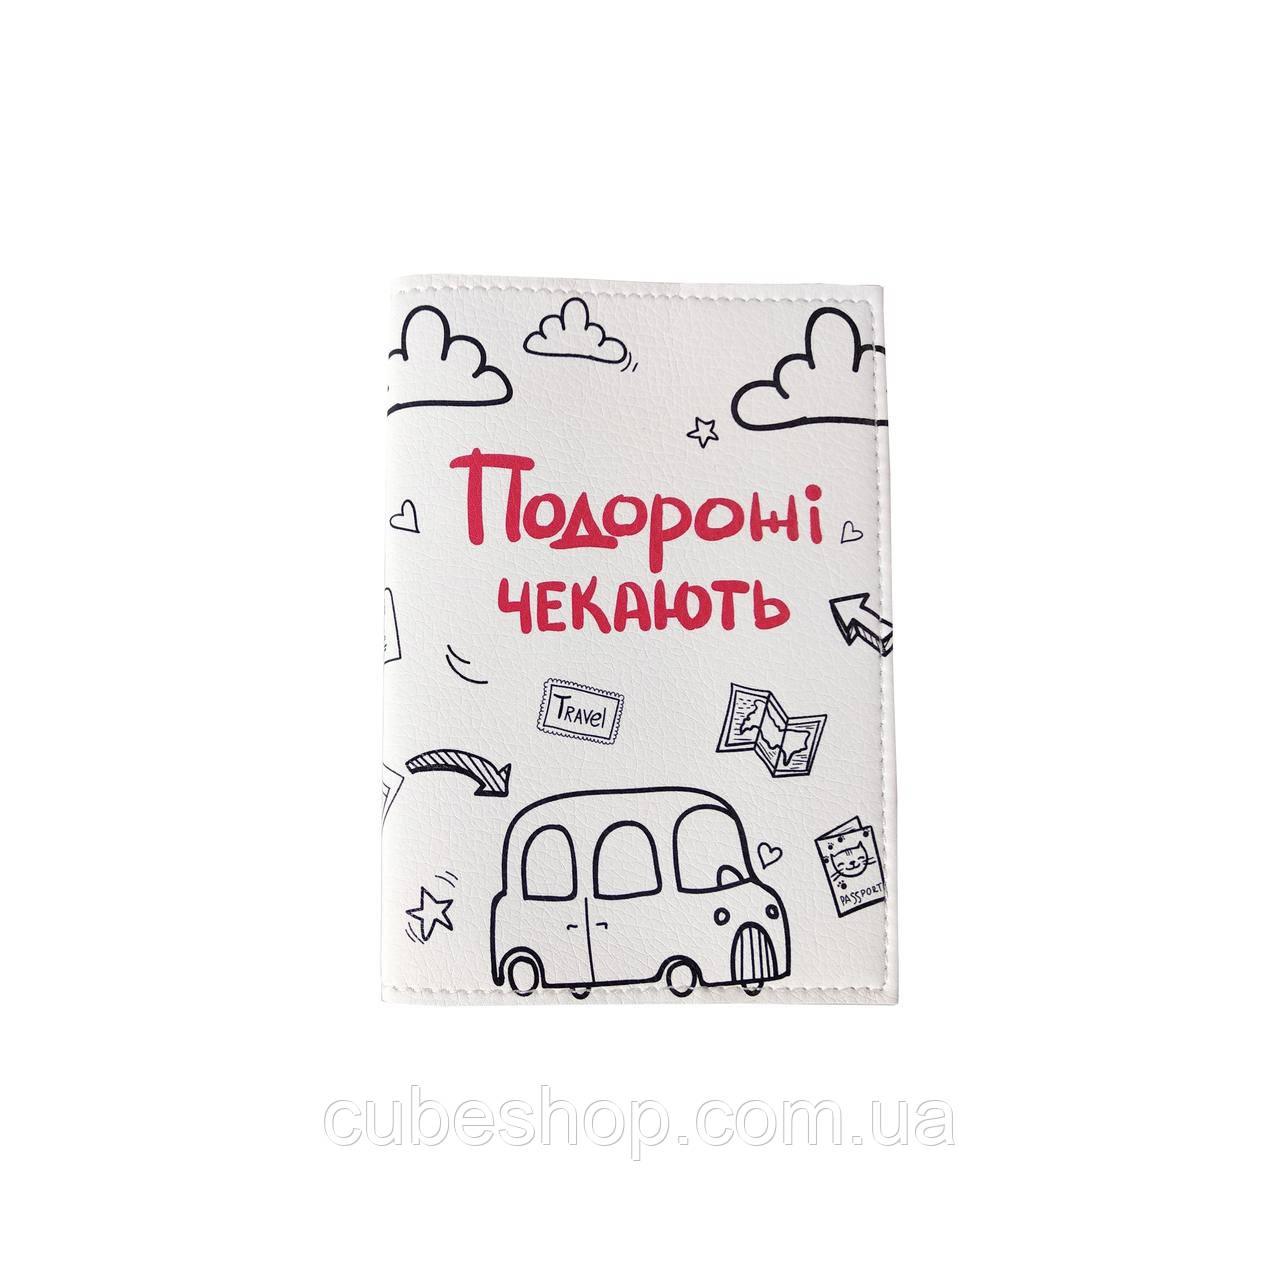 "Обложка для паспорта ""Подорожі чєкають"" белый"